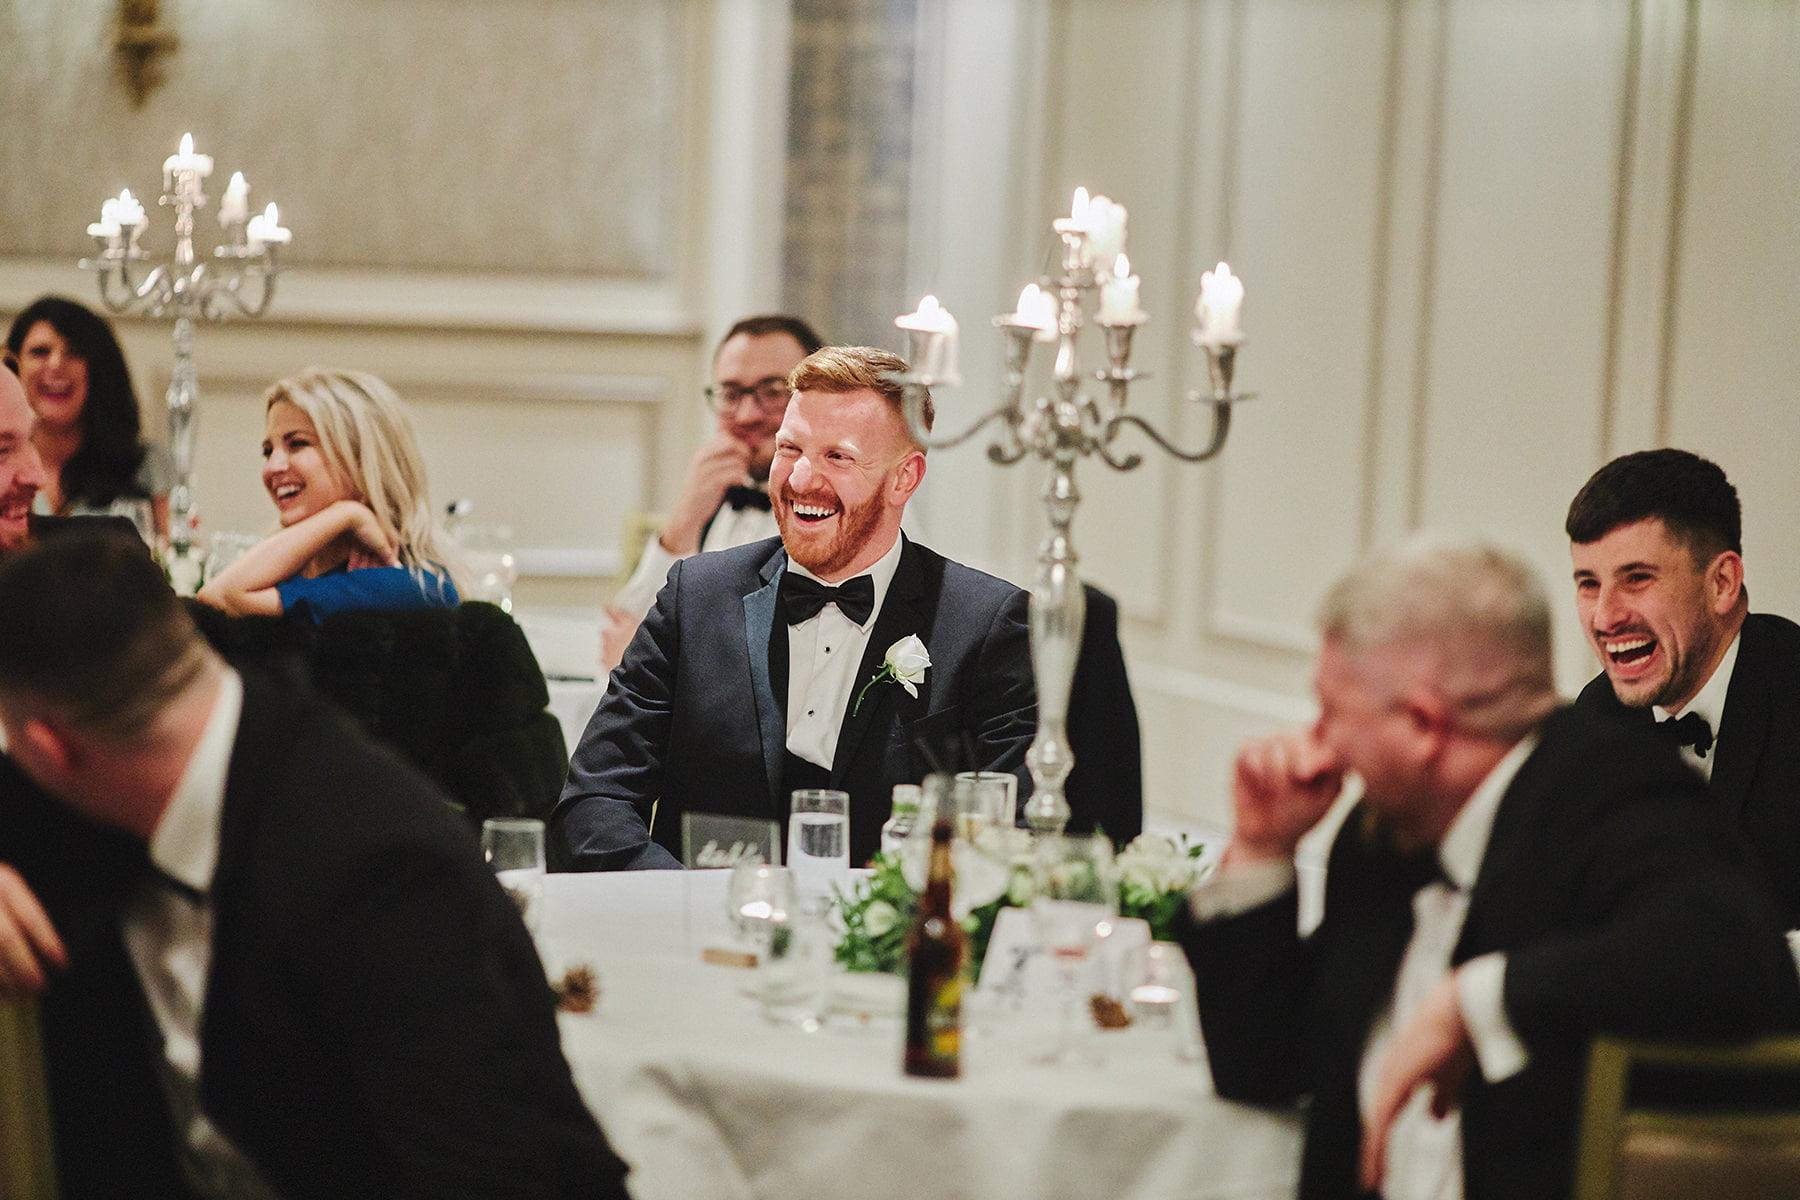 POWERSCOURT HOTEL RESORT INTIMATE WEDDING 95